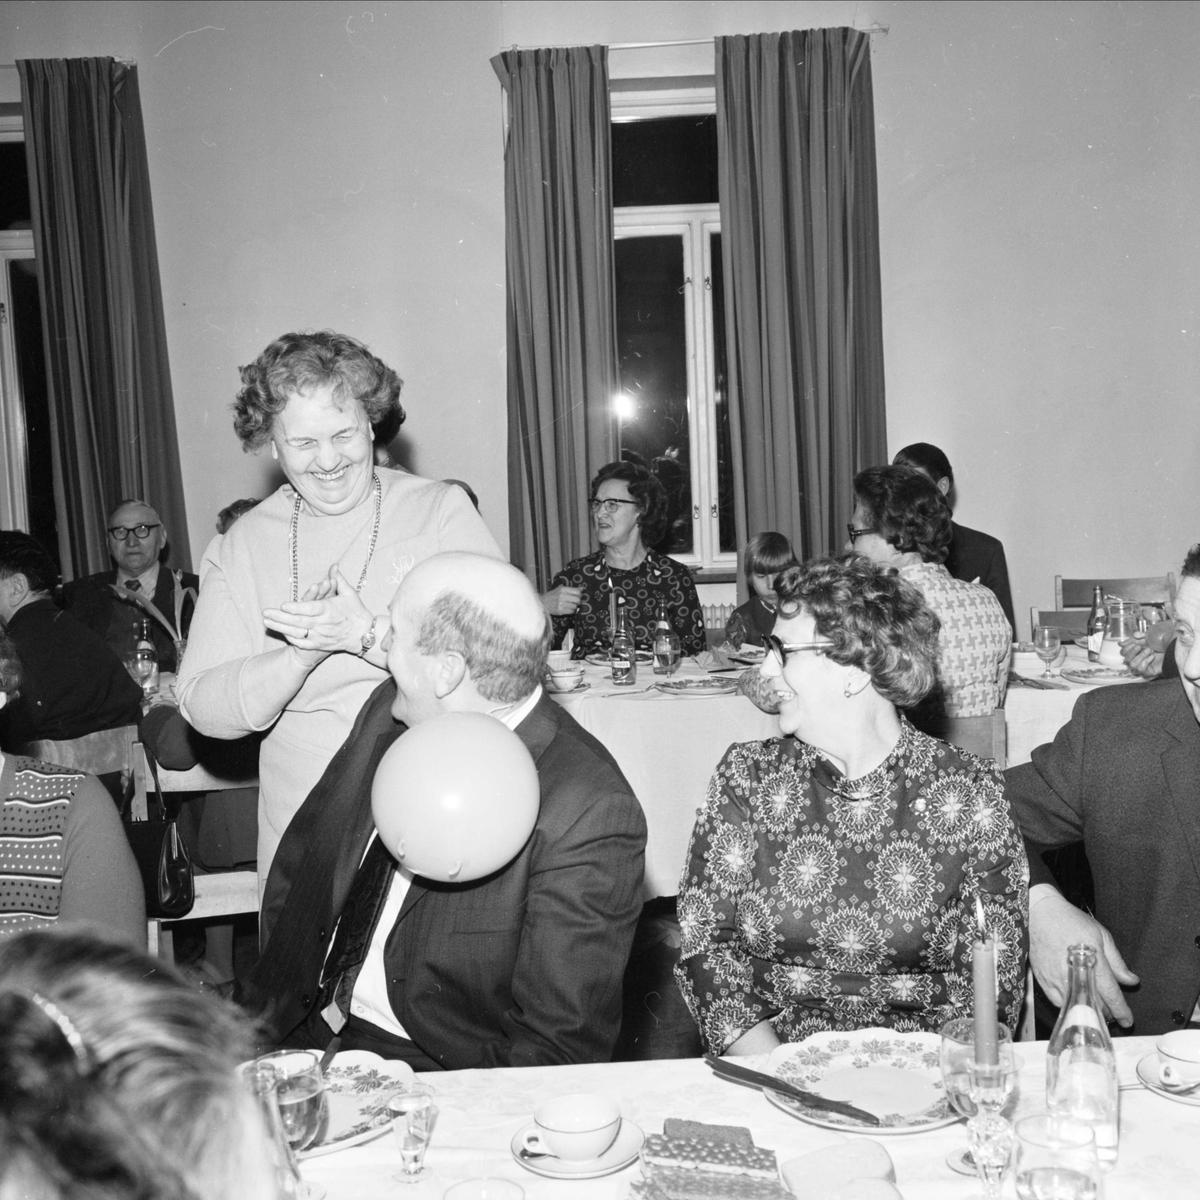 DHR Tierp har sillsexa, Tierp, Uppland januari 1973